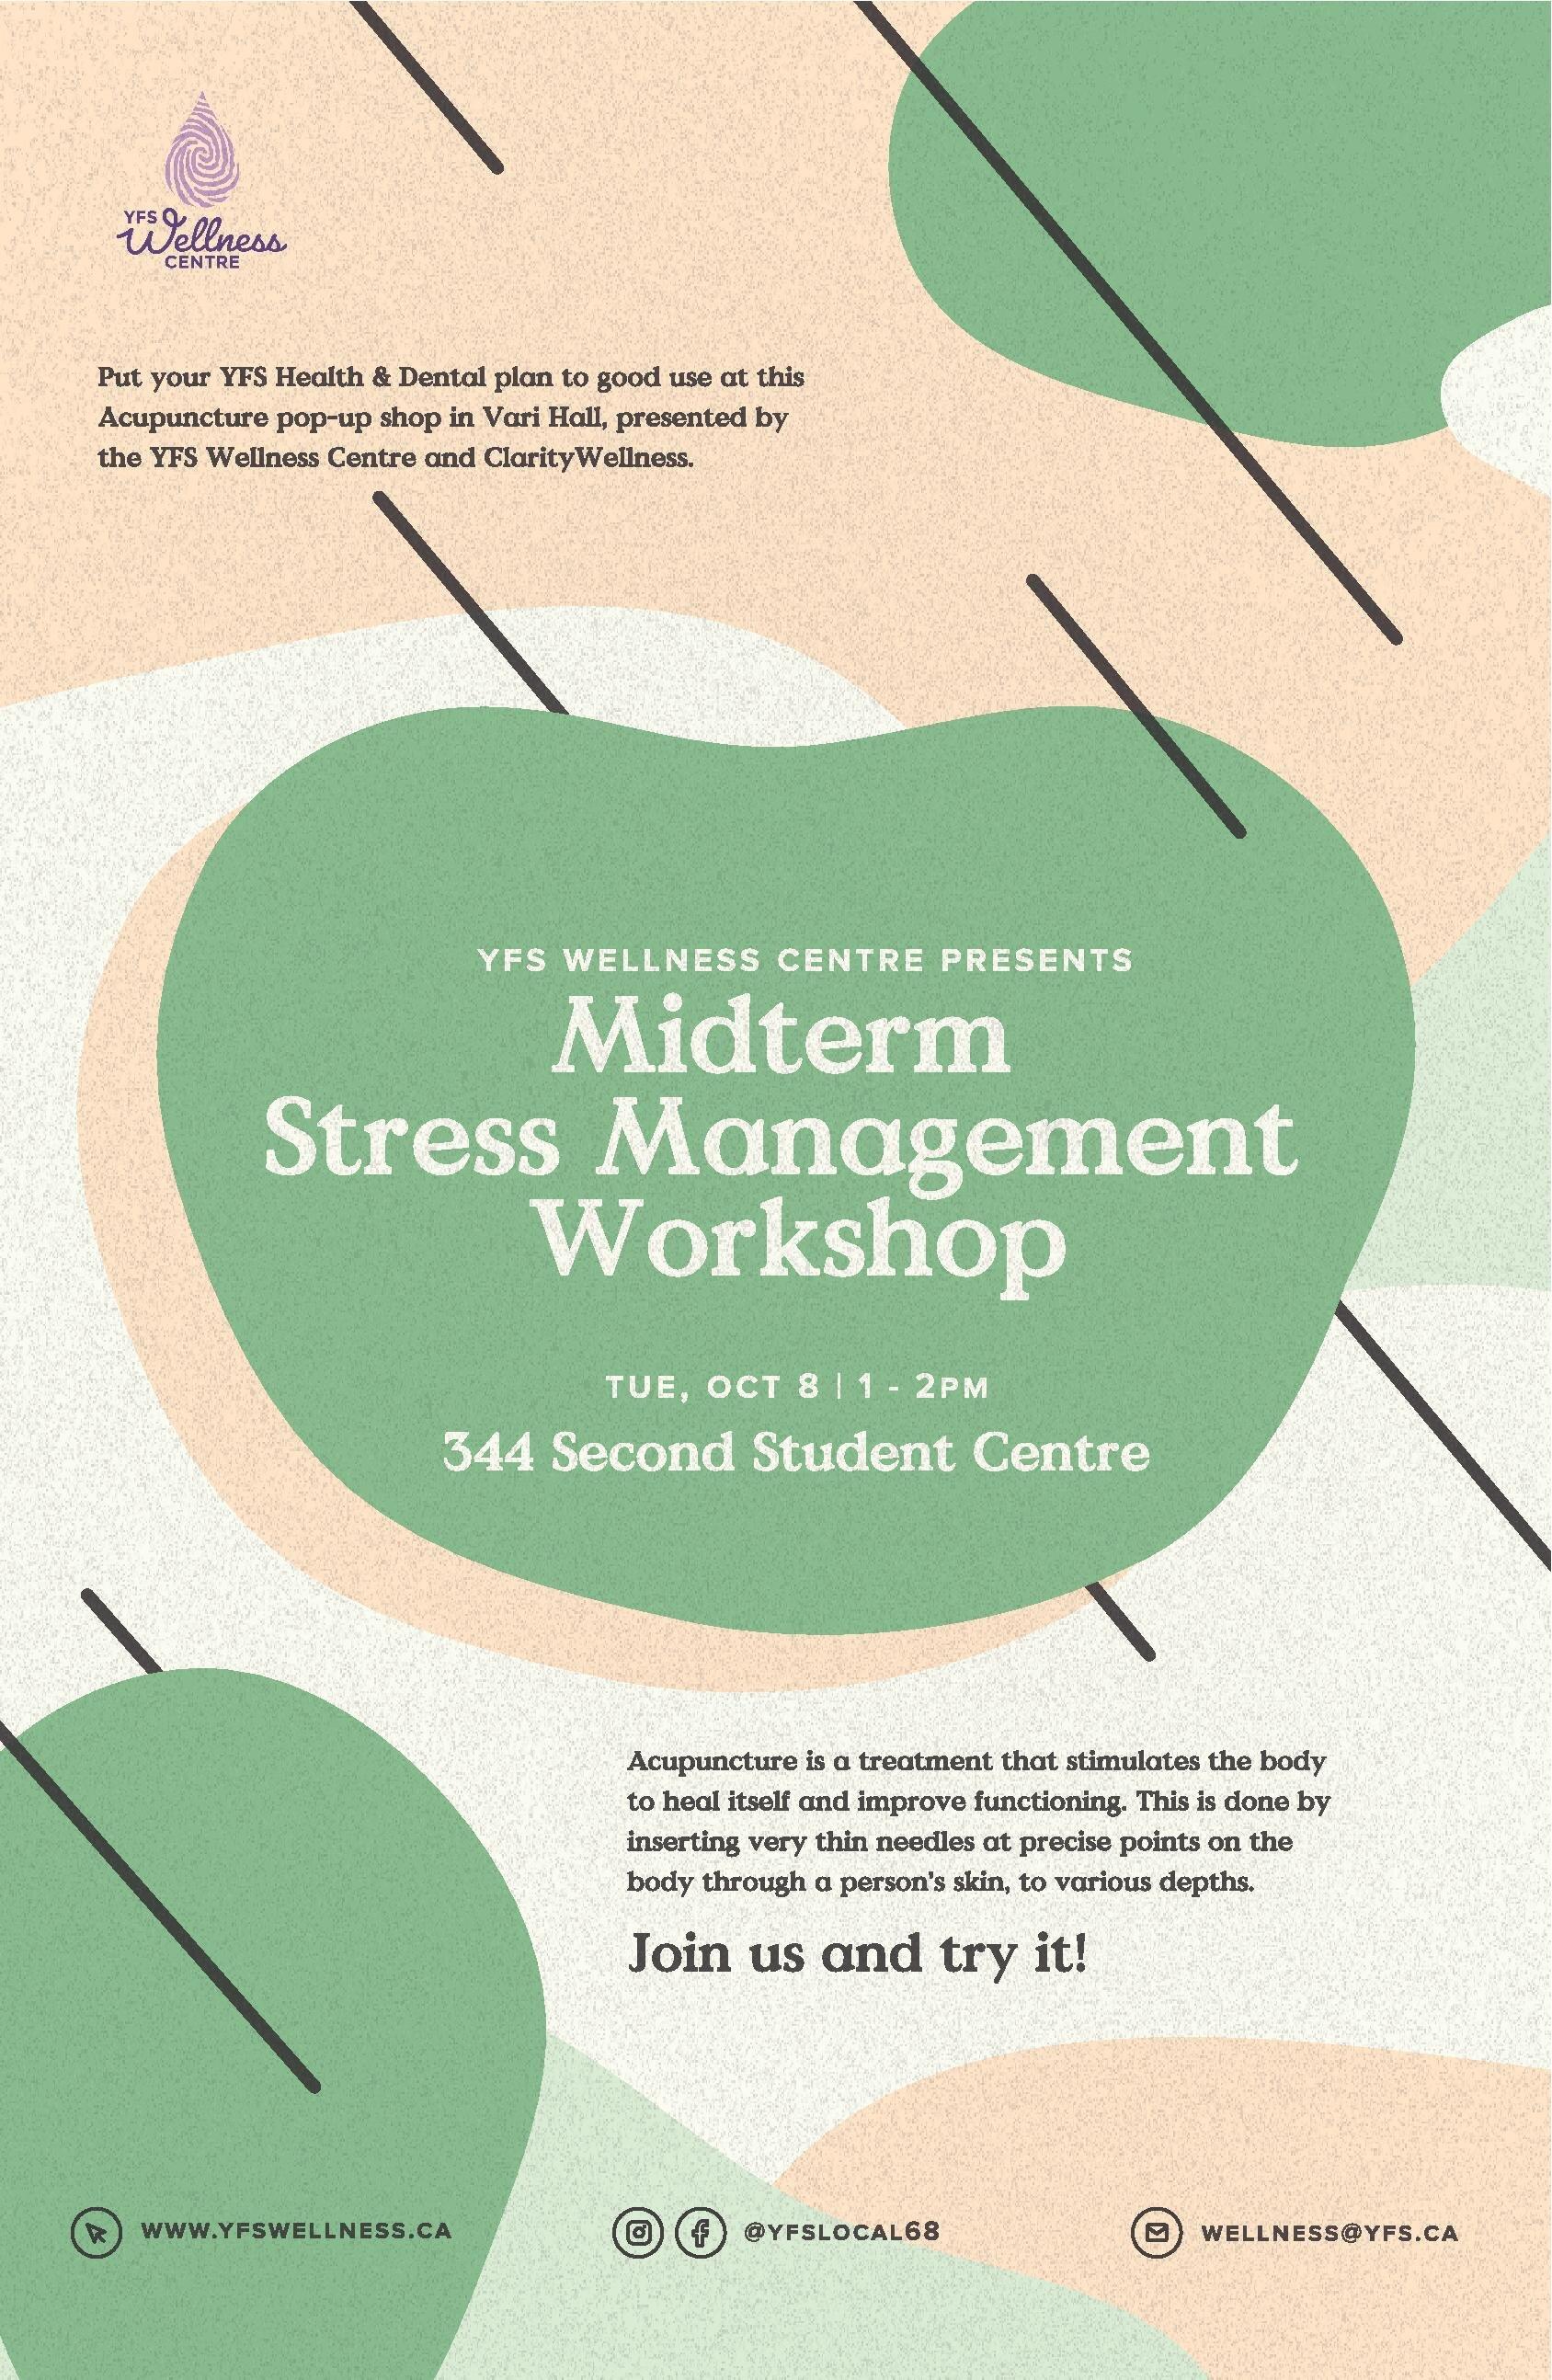 YFS_WellnessCentre_StressManagementWorkshop_Poster_printfile (1)-page-001.jpg